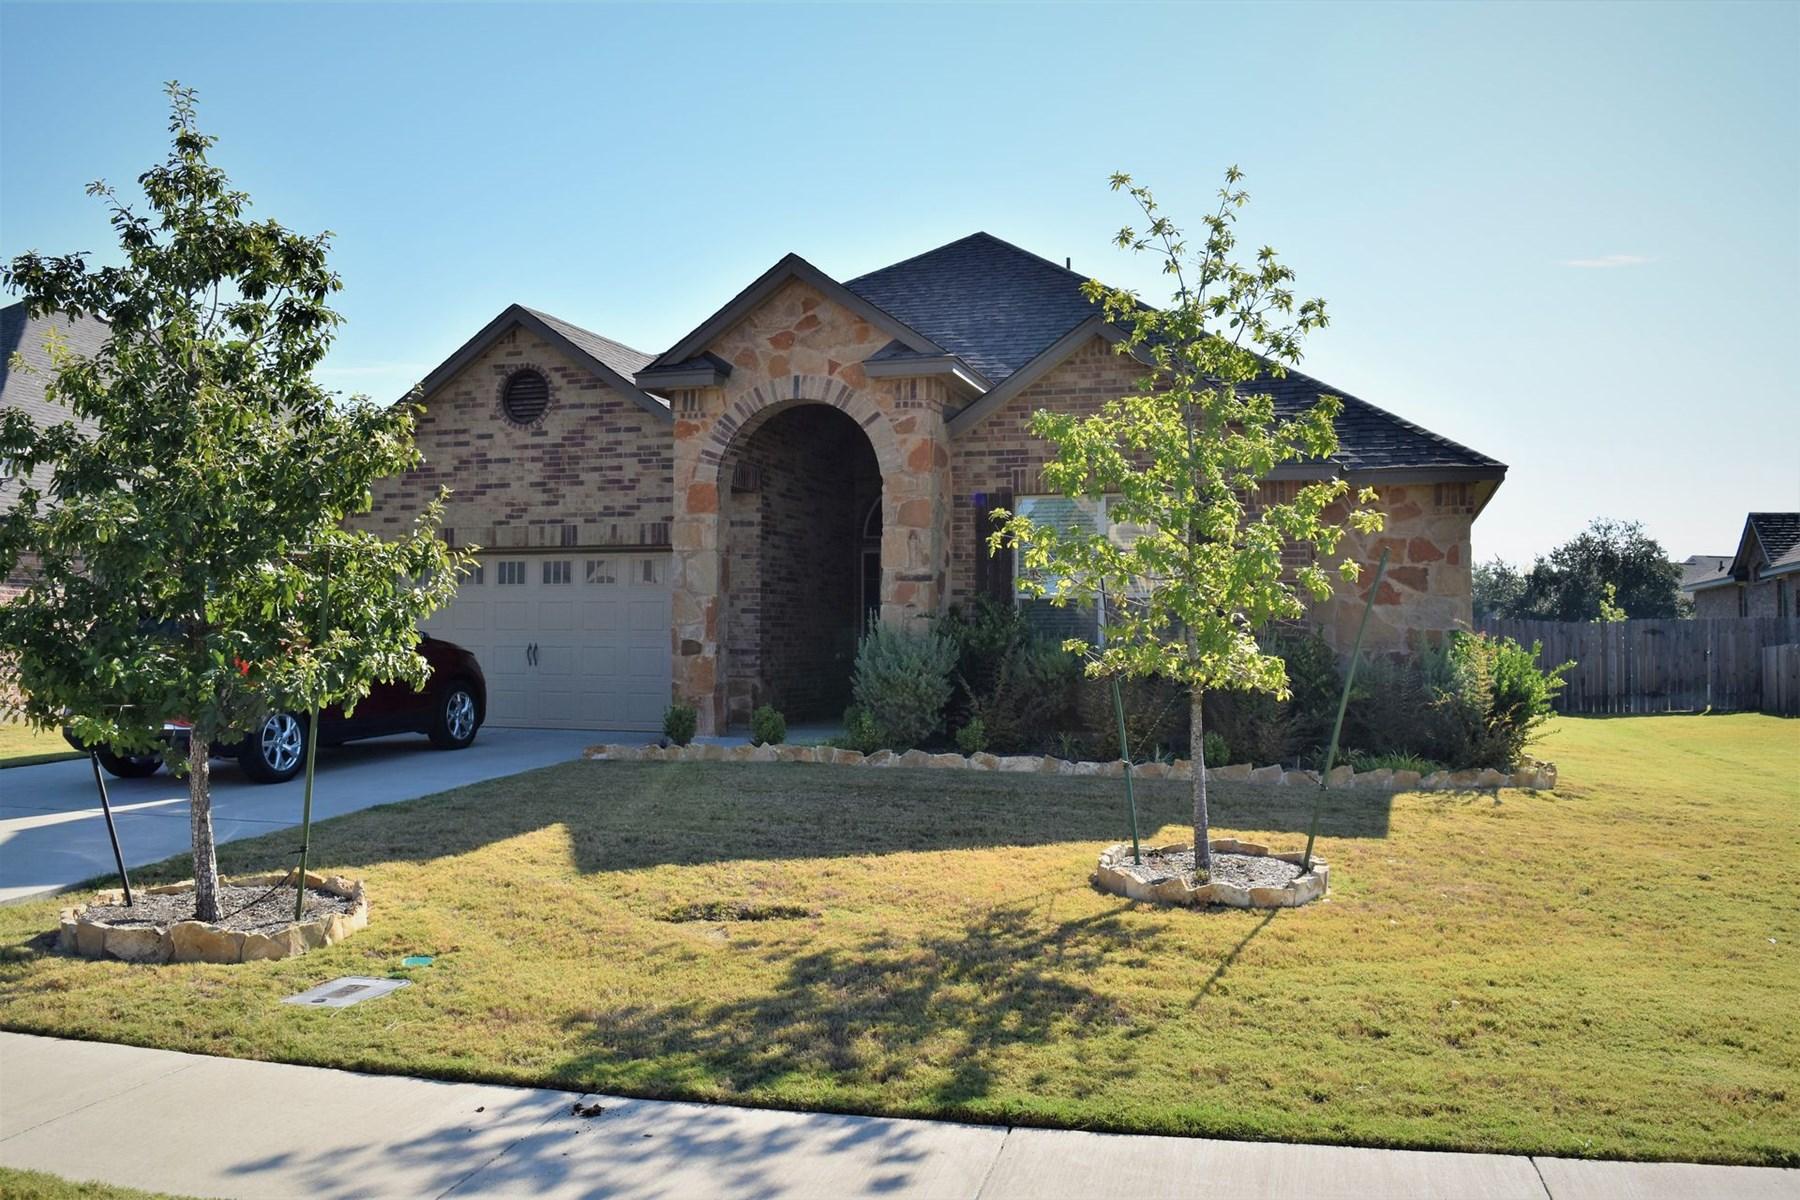 Waco Texas McLennan County Central Texas Home for Sale